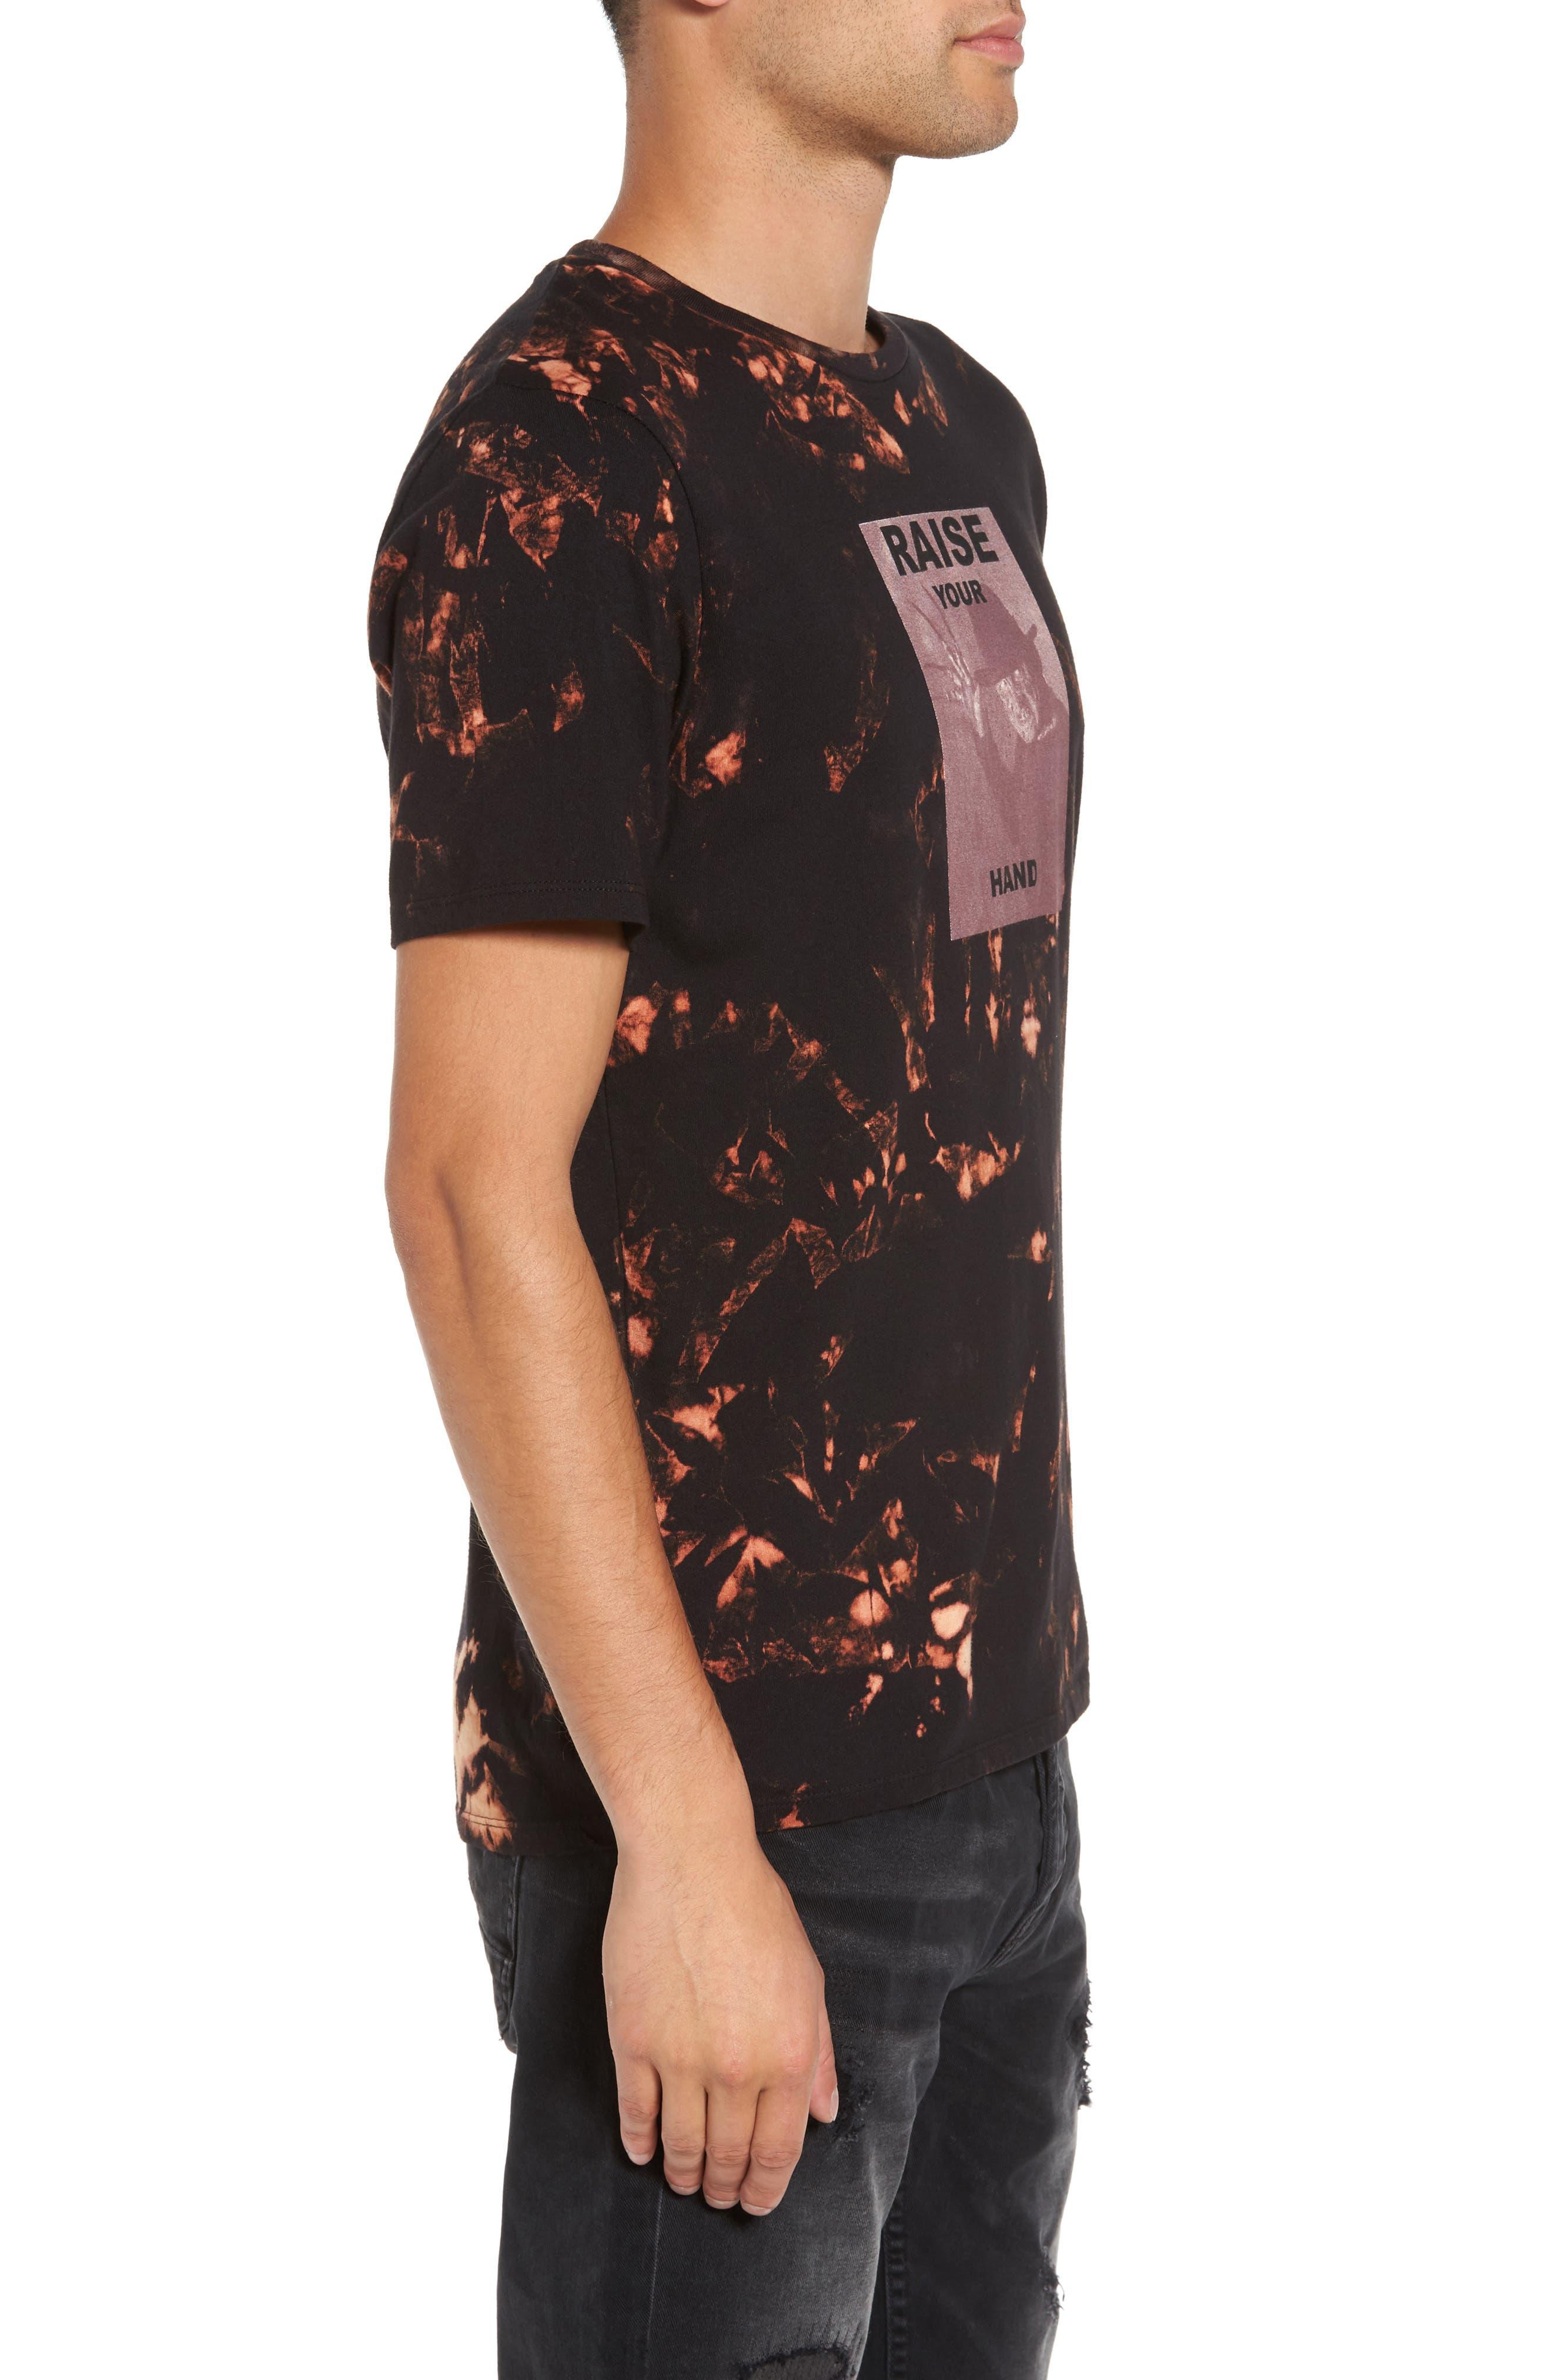 Favred T-Shirt,                             Alternate thumbnail 3, color,                             002